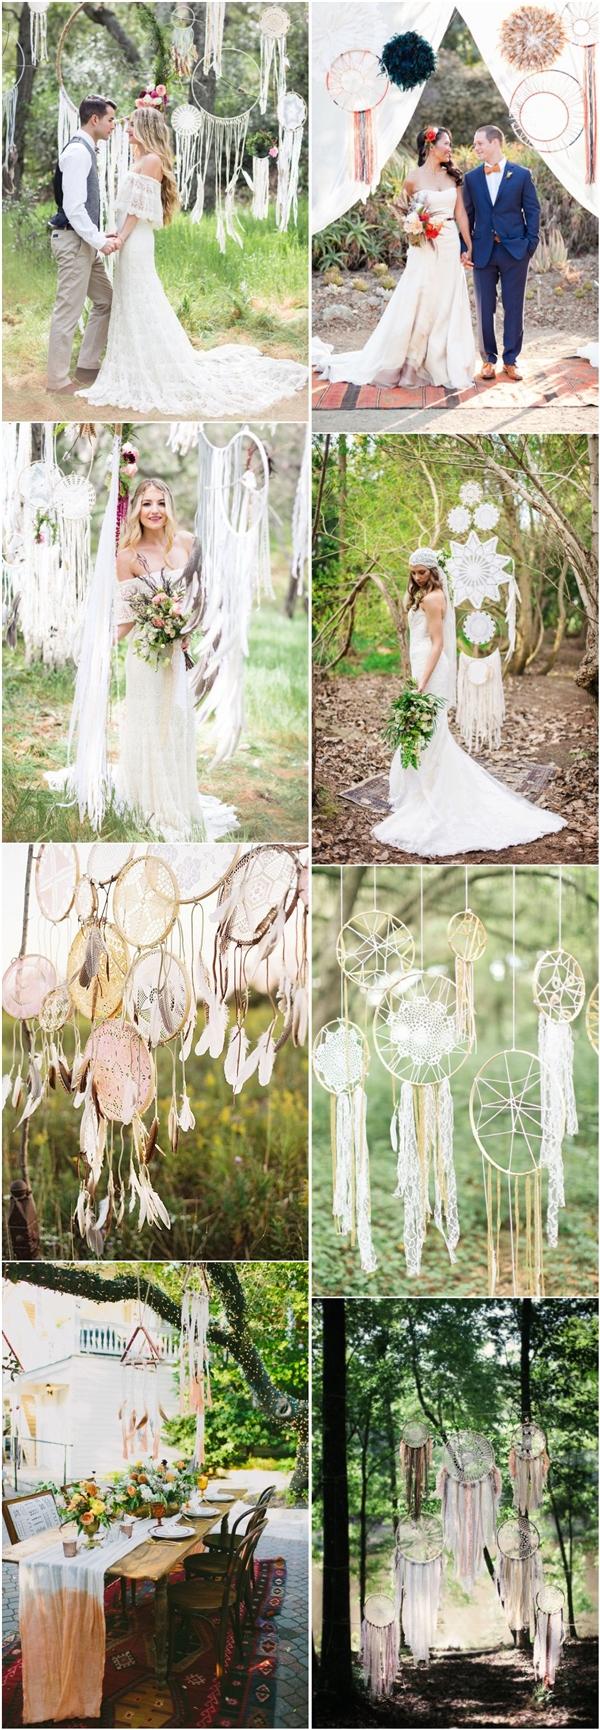 Boho Wedding Decor 30 Dreamcatchers Boho Wedding Decor Ideas Deer Pearl Flowers